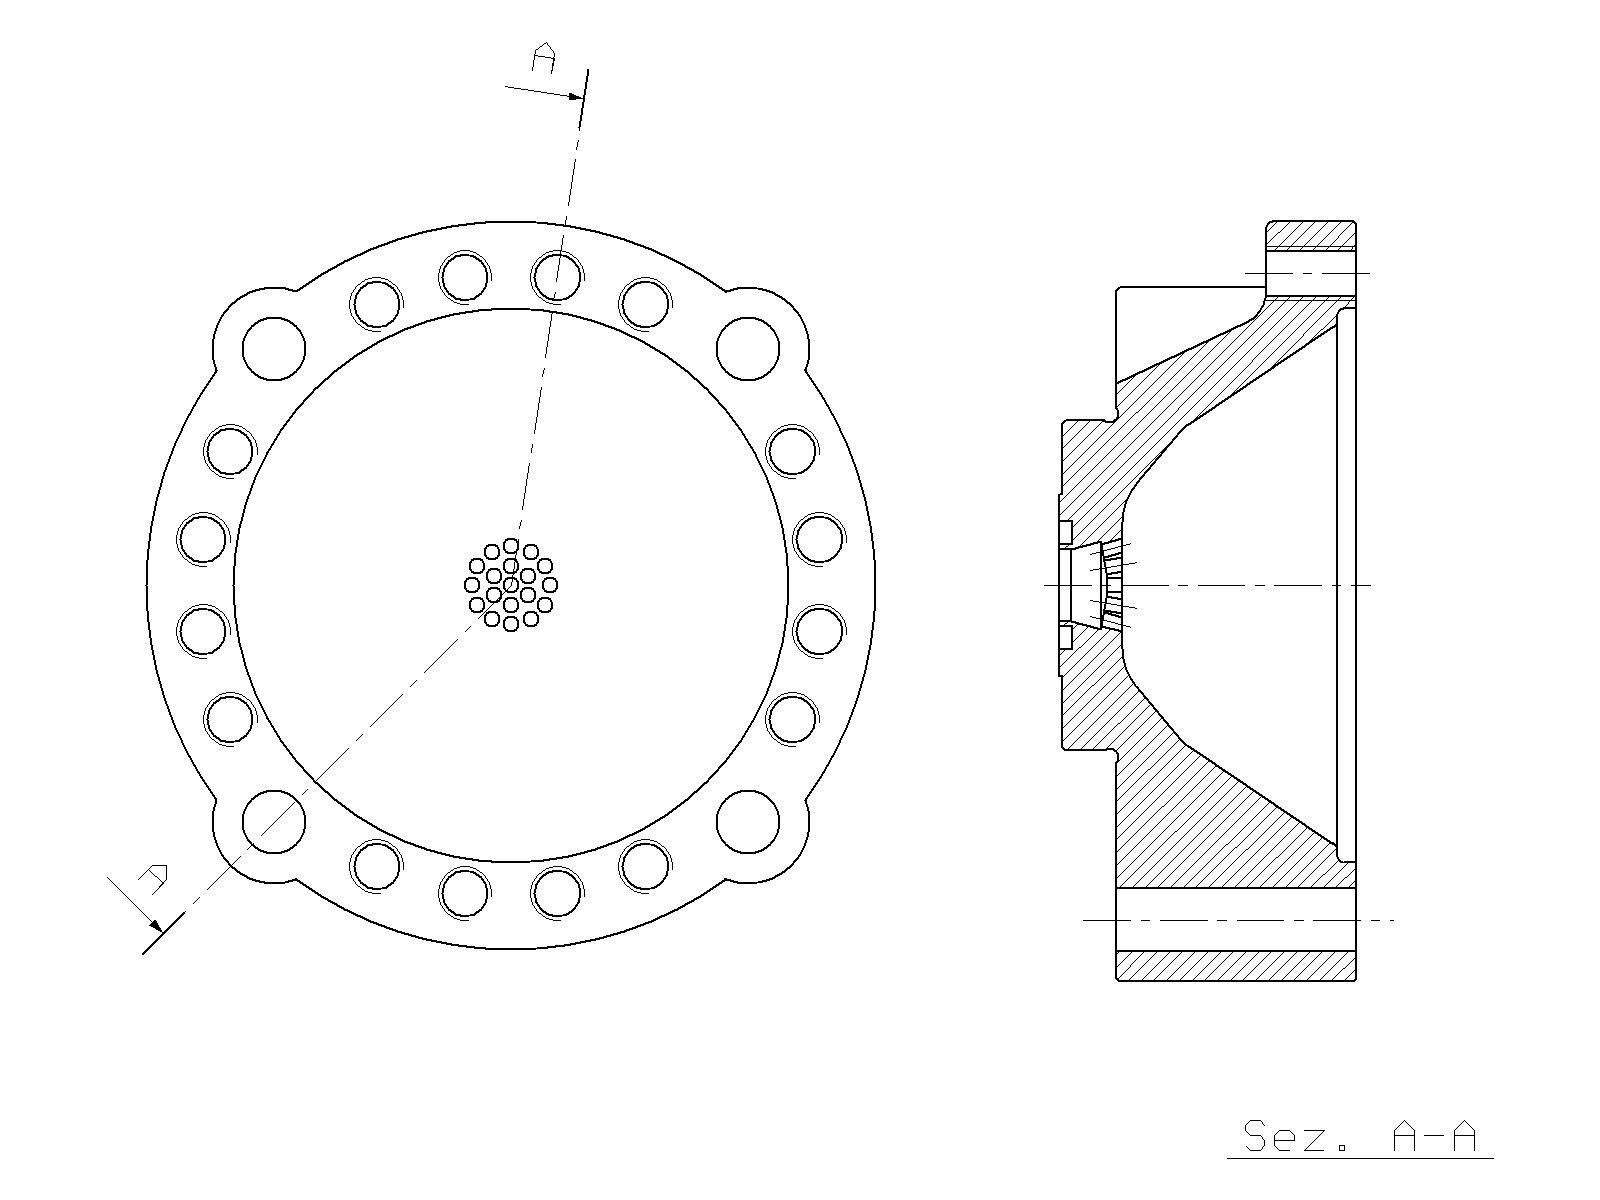 Accumulator Lower Half Krupp Hm 960 Hydraulic Hammer Spare Parts